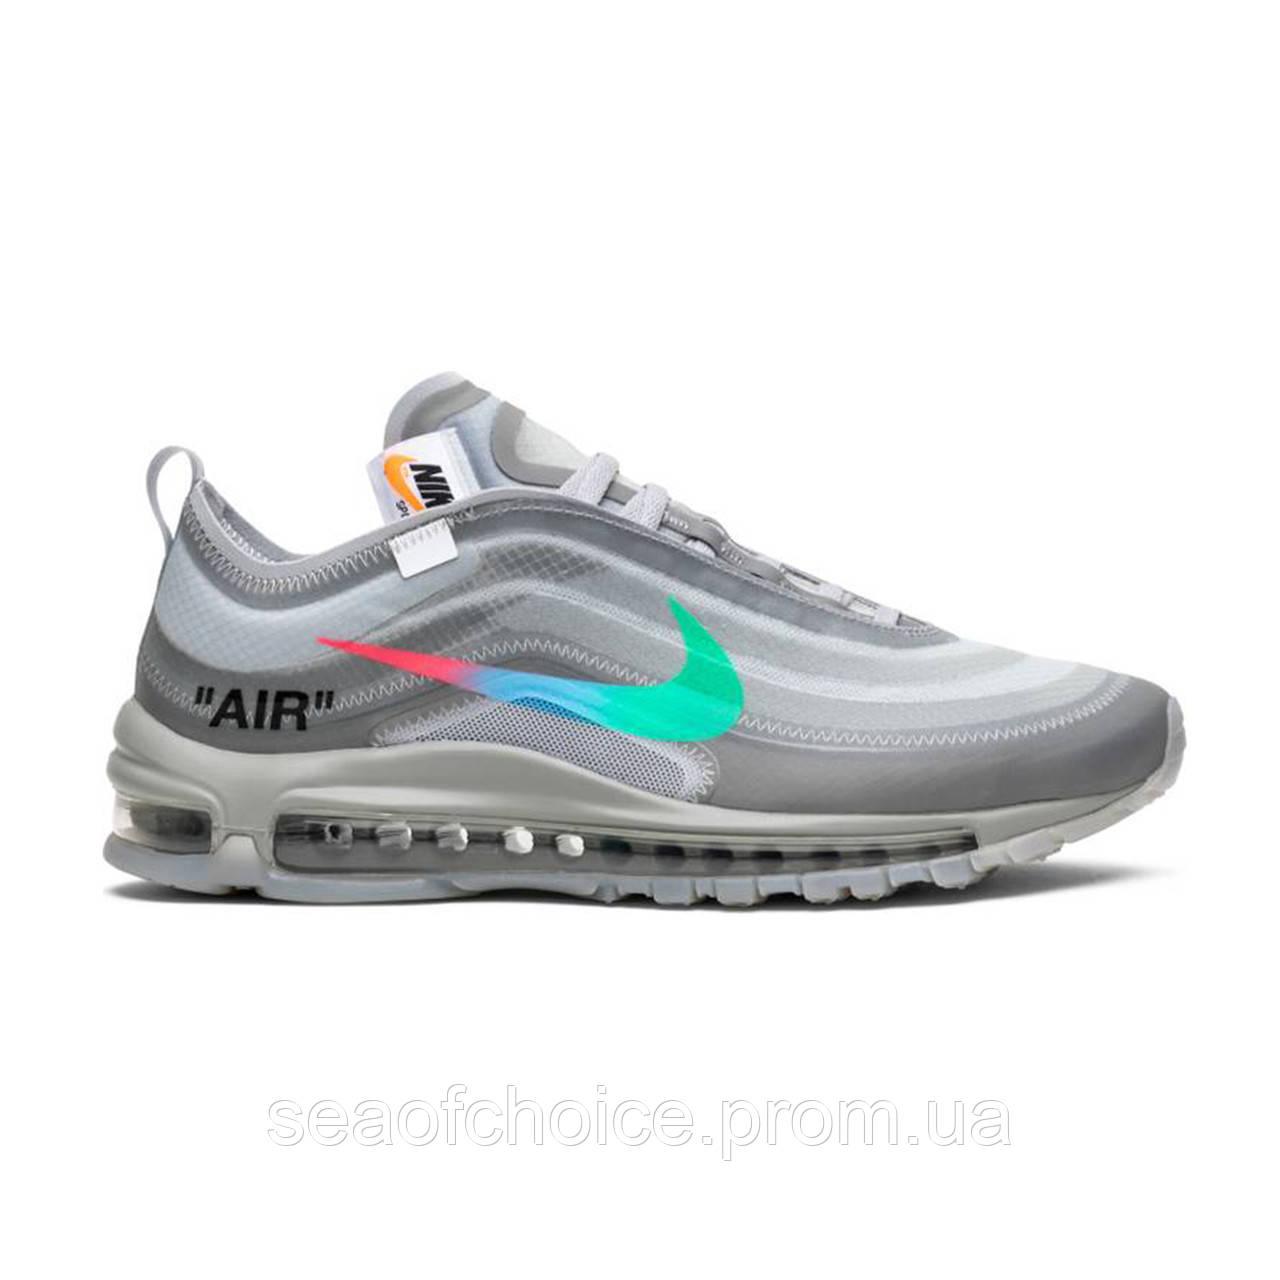 Кроссовки Off White x Nike Air Max 97 Menta